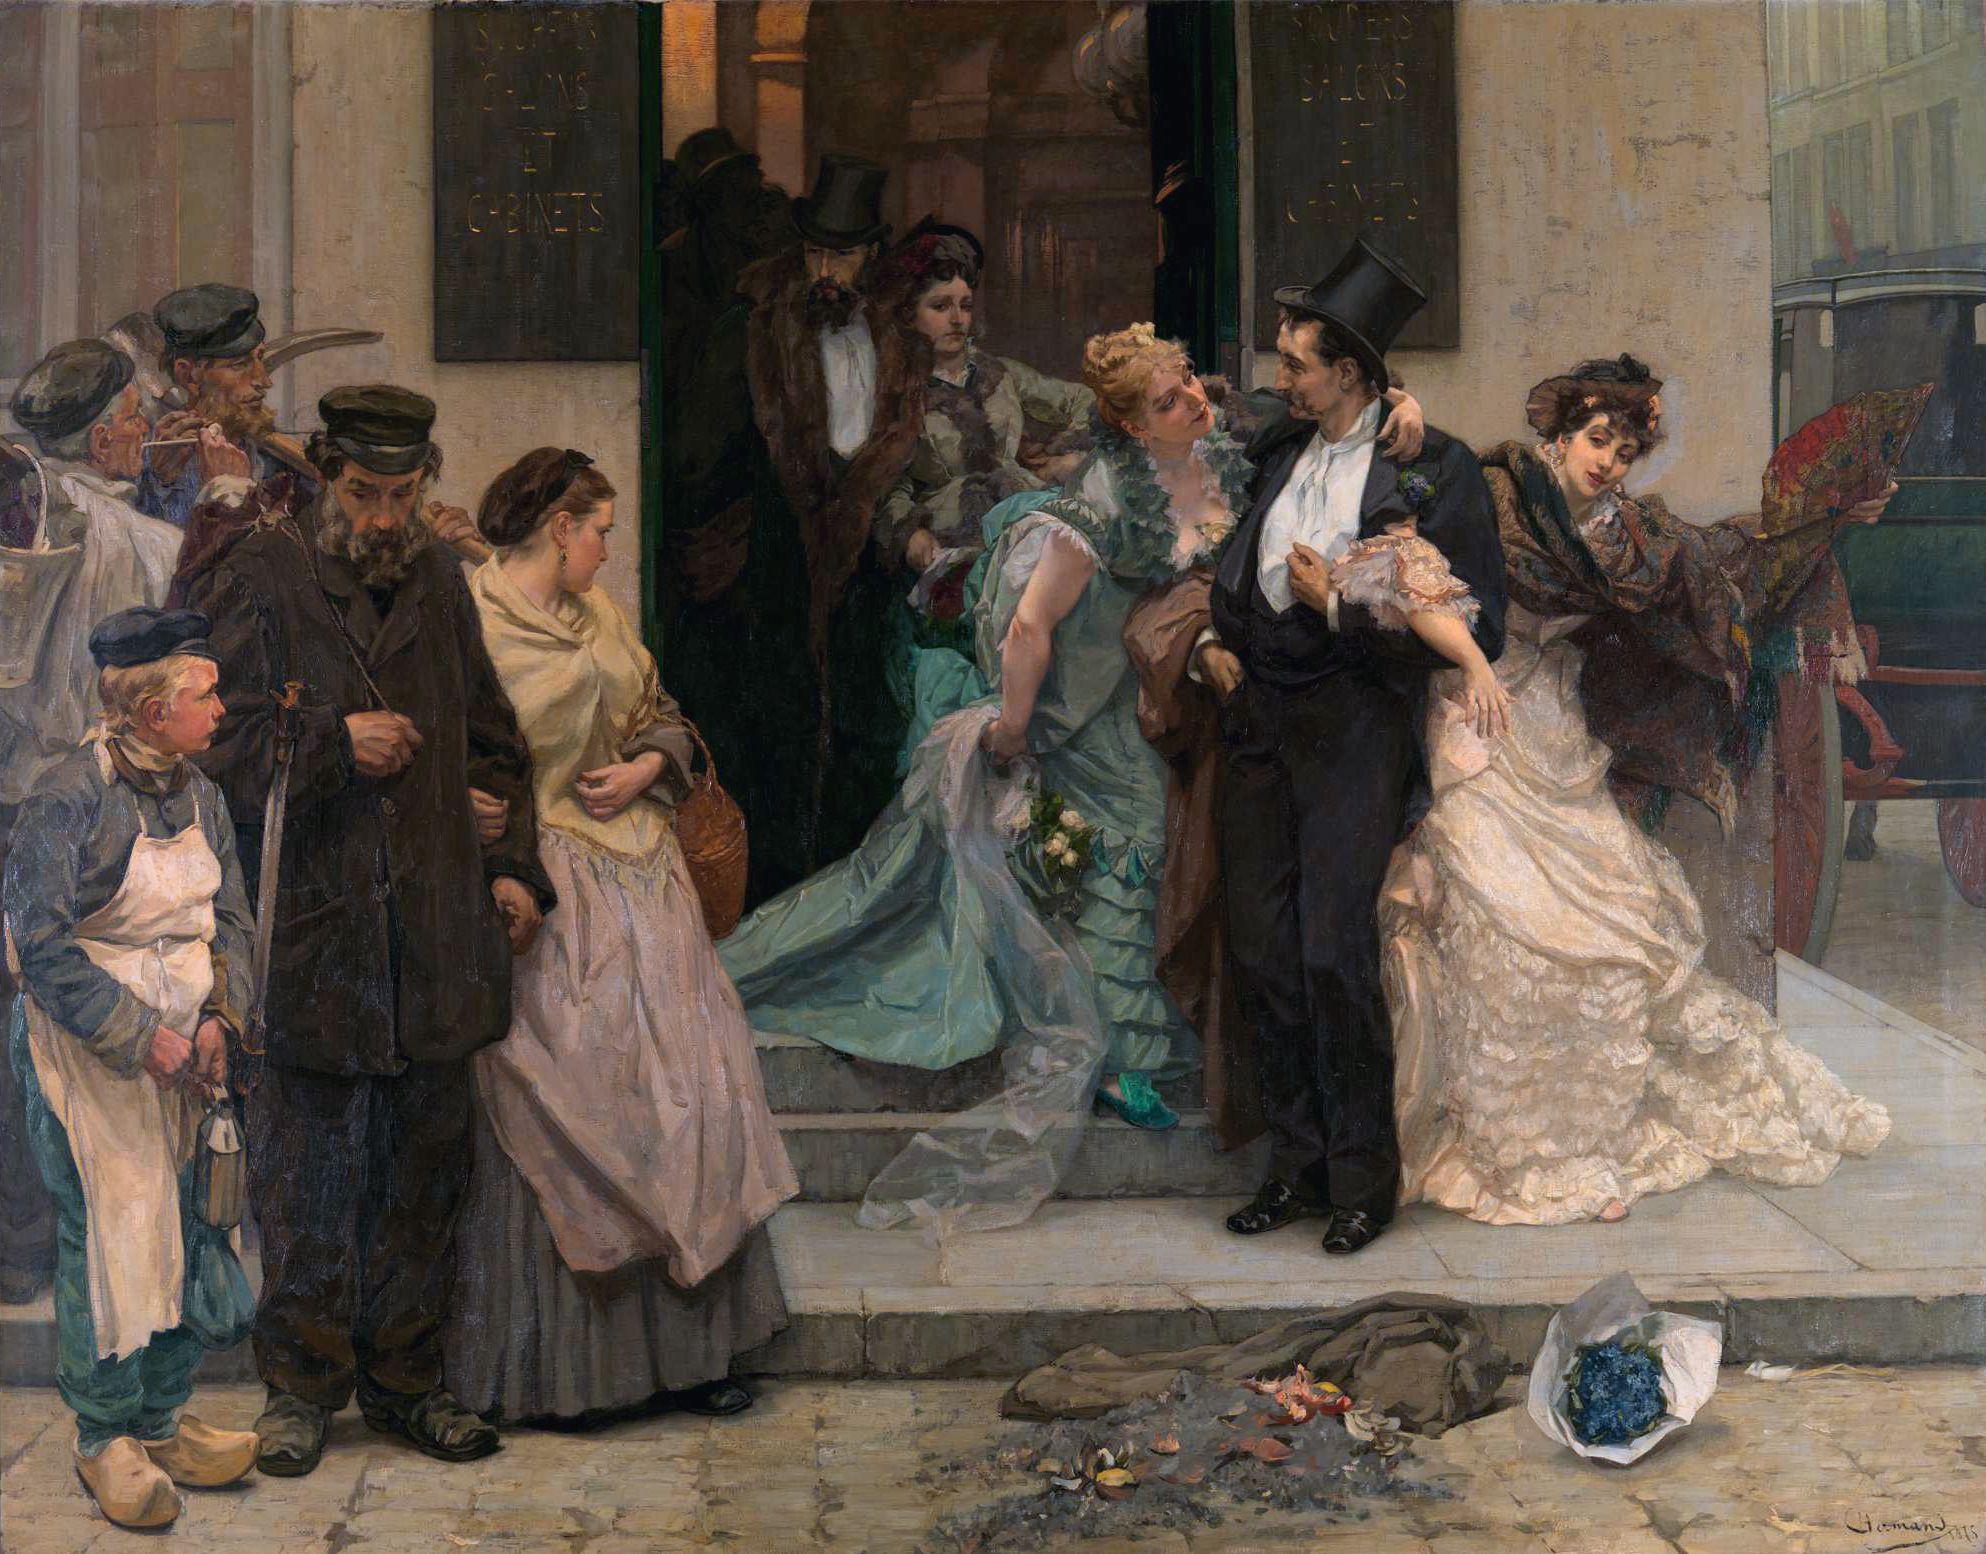 PEINTURE DE CHARLES HERMANS........1875.......L'AUBE.....SOURCE WIKIMEDIA.ORG.............